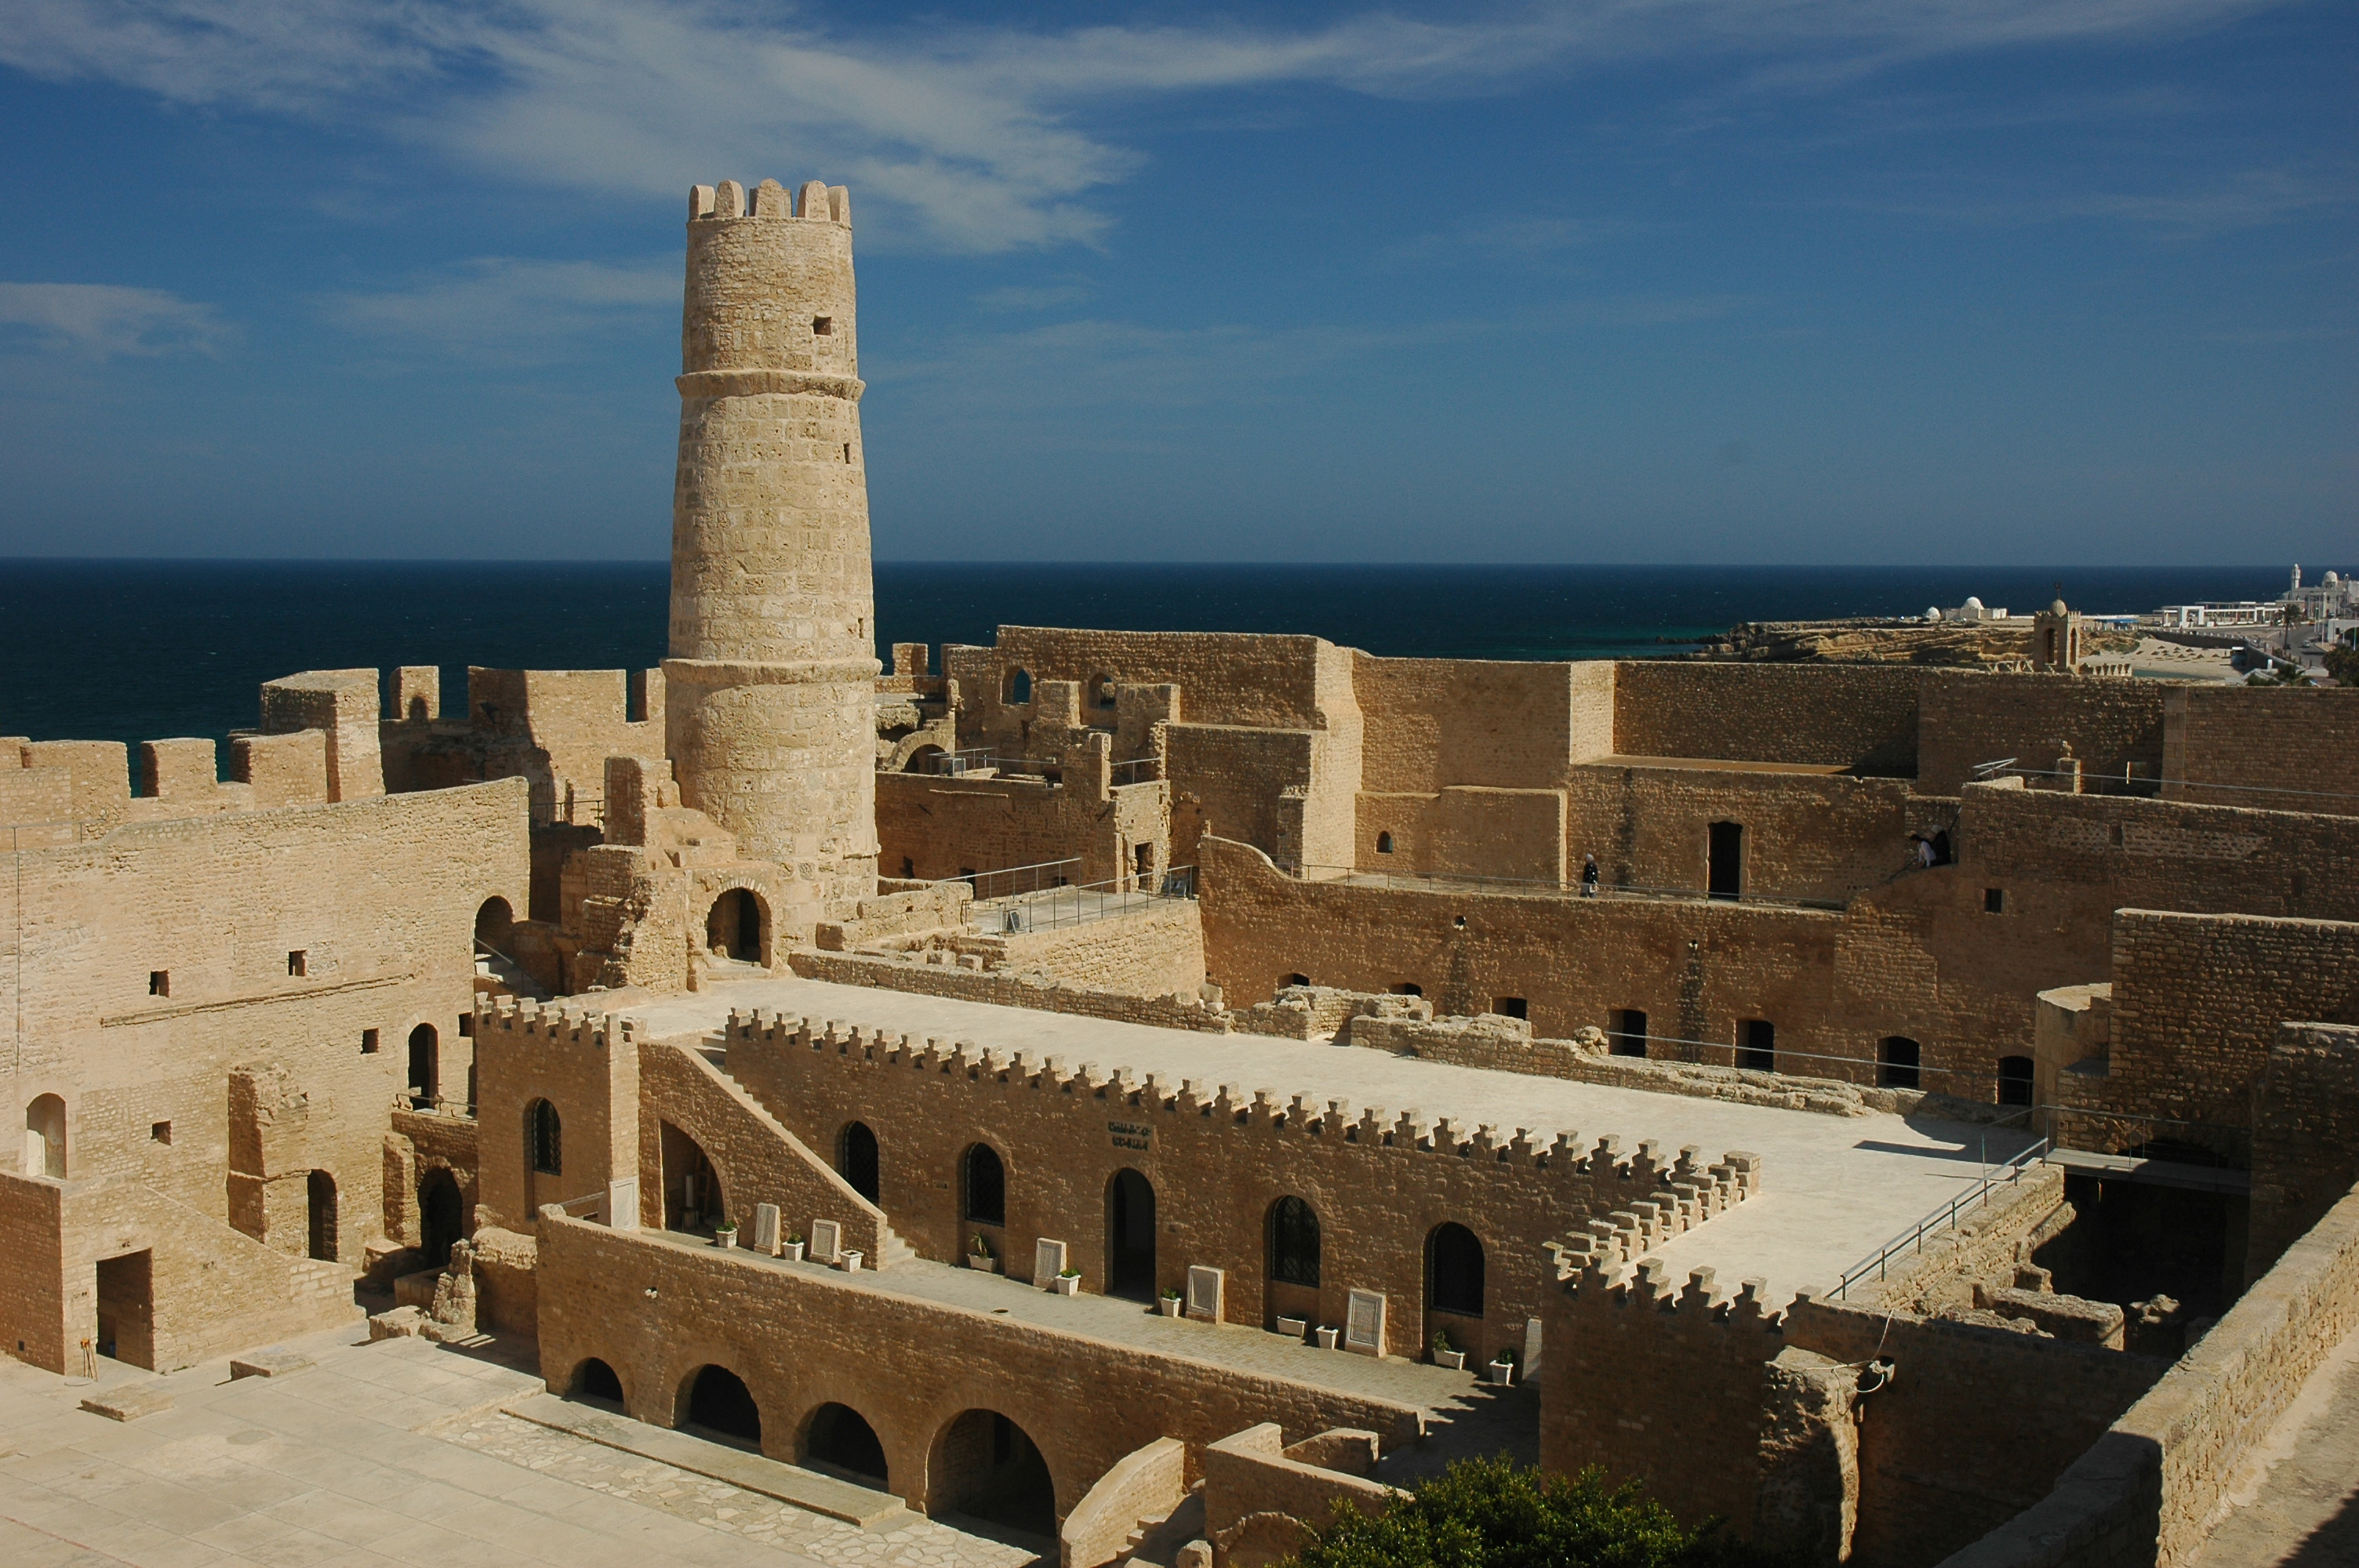 Ribat de Monastir - Arabisation et islamisation de la Tunisie